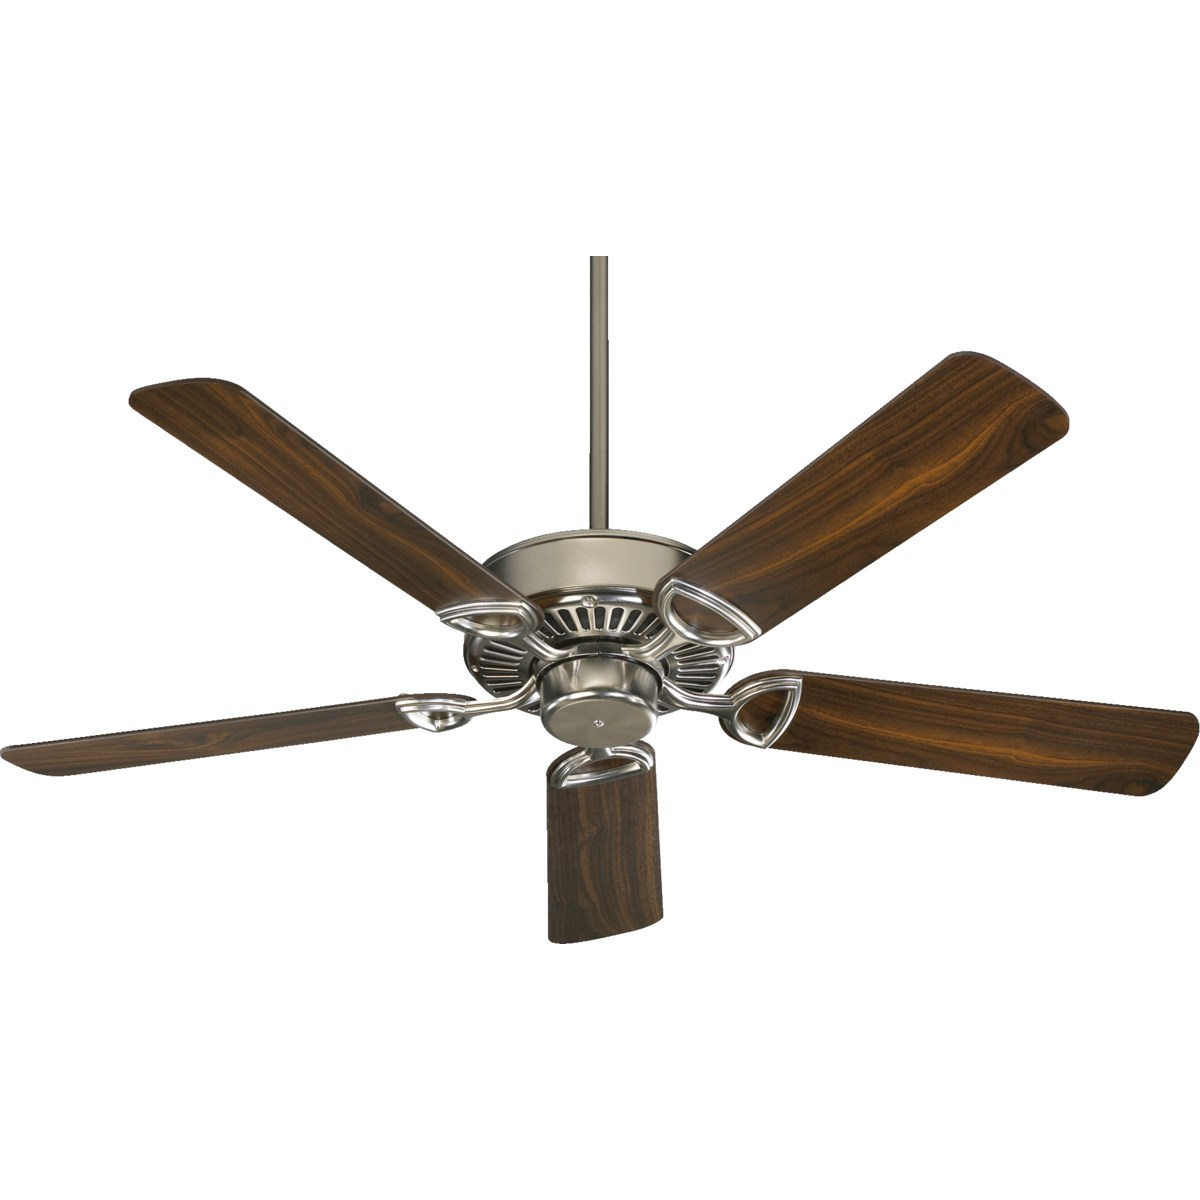 Estate 52-in 5 Blade Satin Nickel Traditional Ceiling Fan